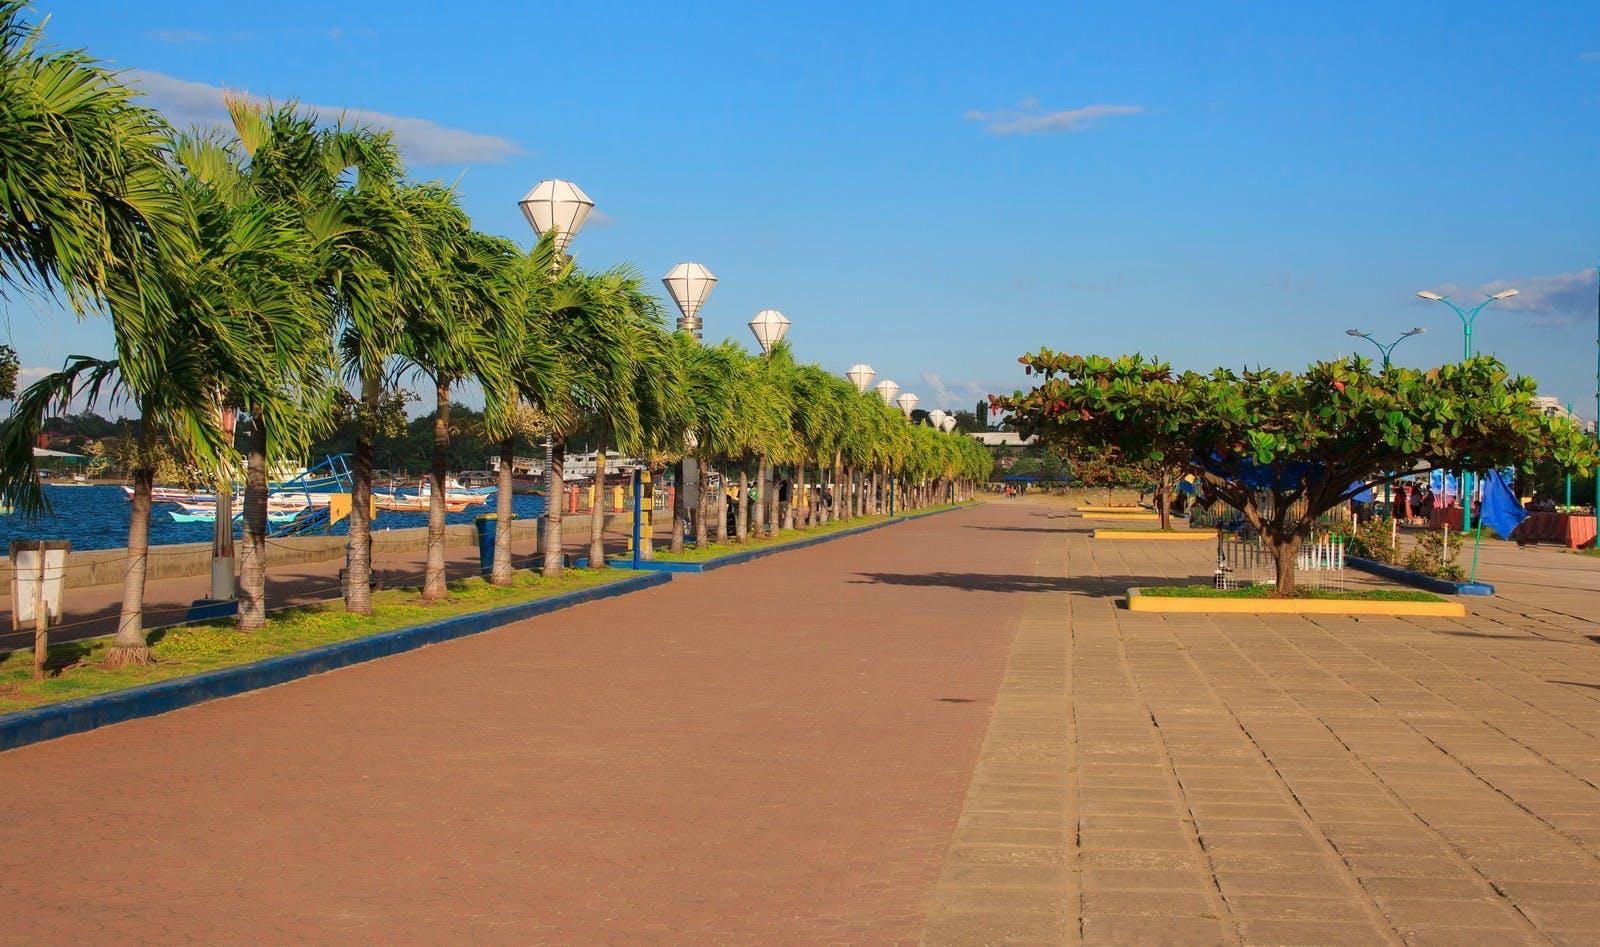 Half-Day Sightseeing Tour of Puerto Princesa's Top Tourist Spots